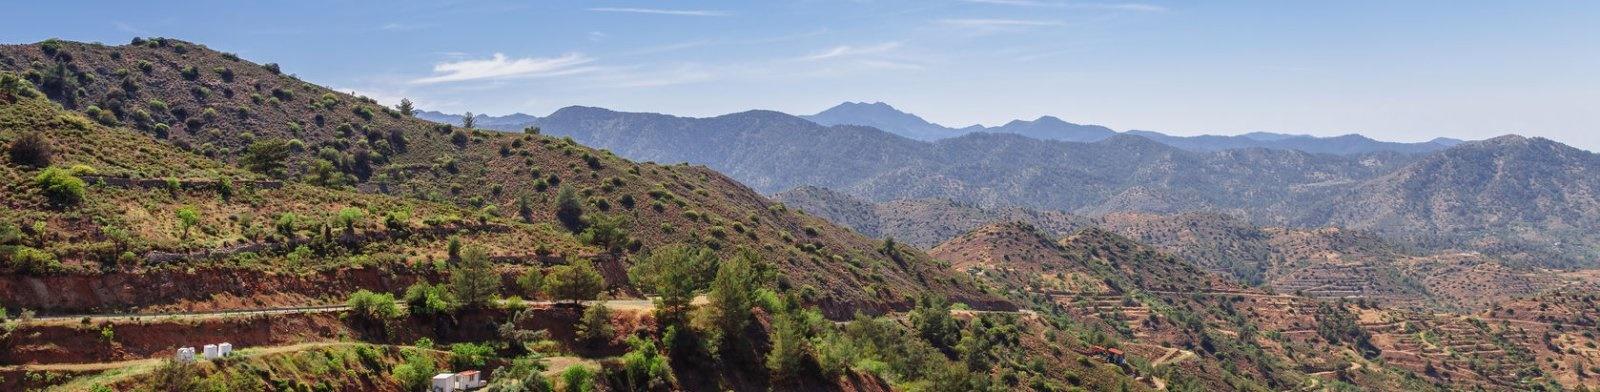 Troodos Mountains, Main image